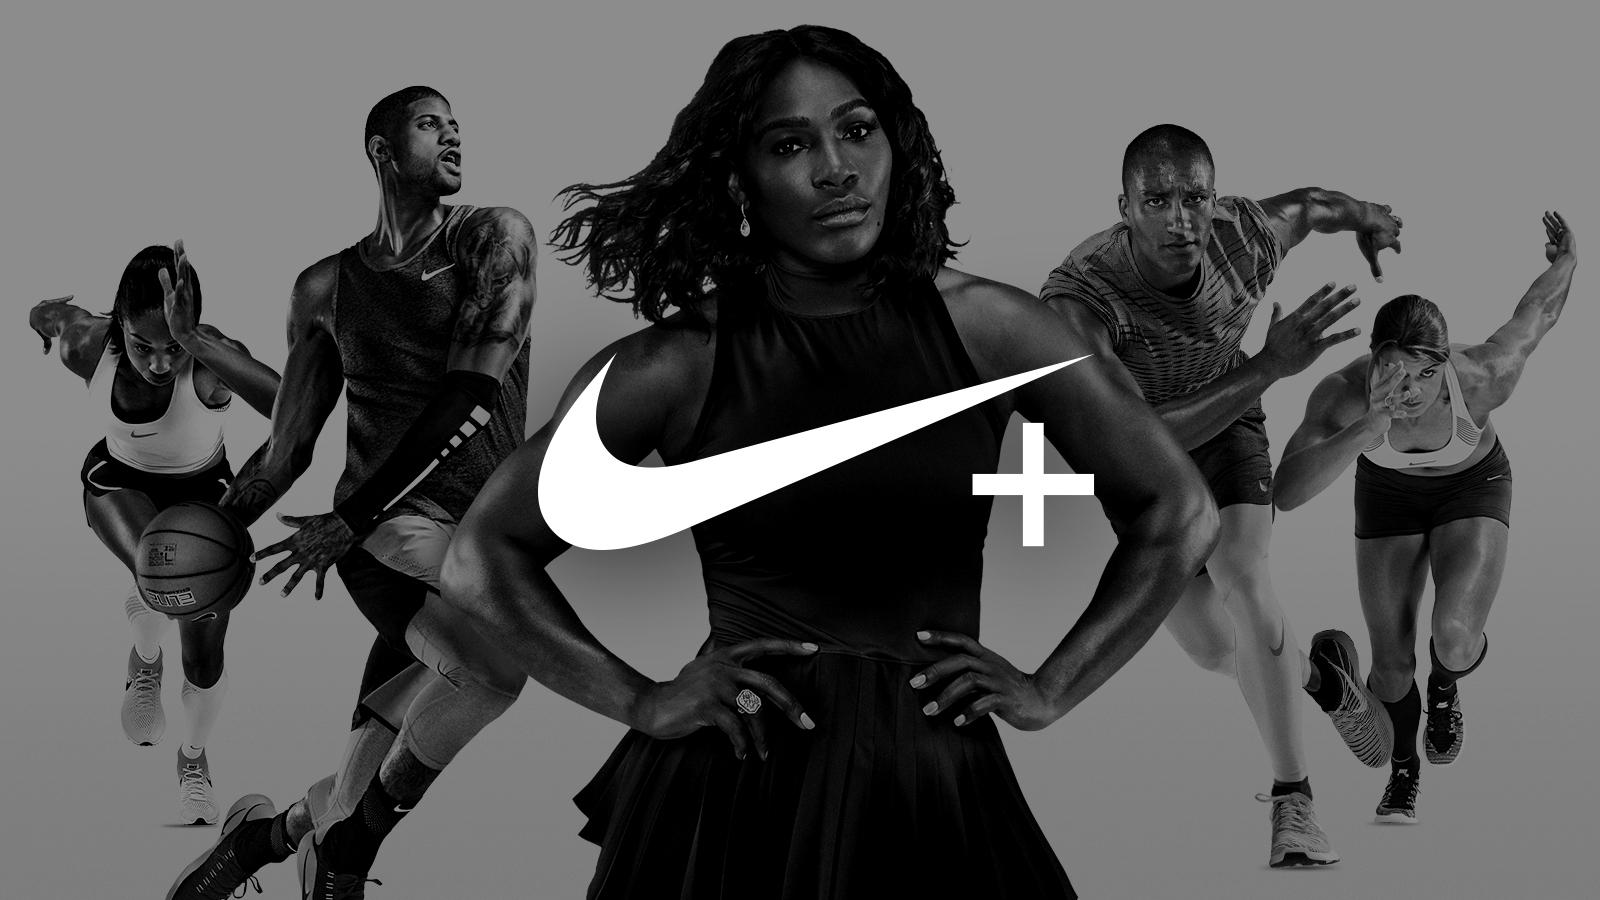 Nike + App has over 28 million global users.